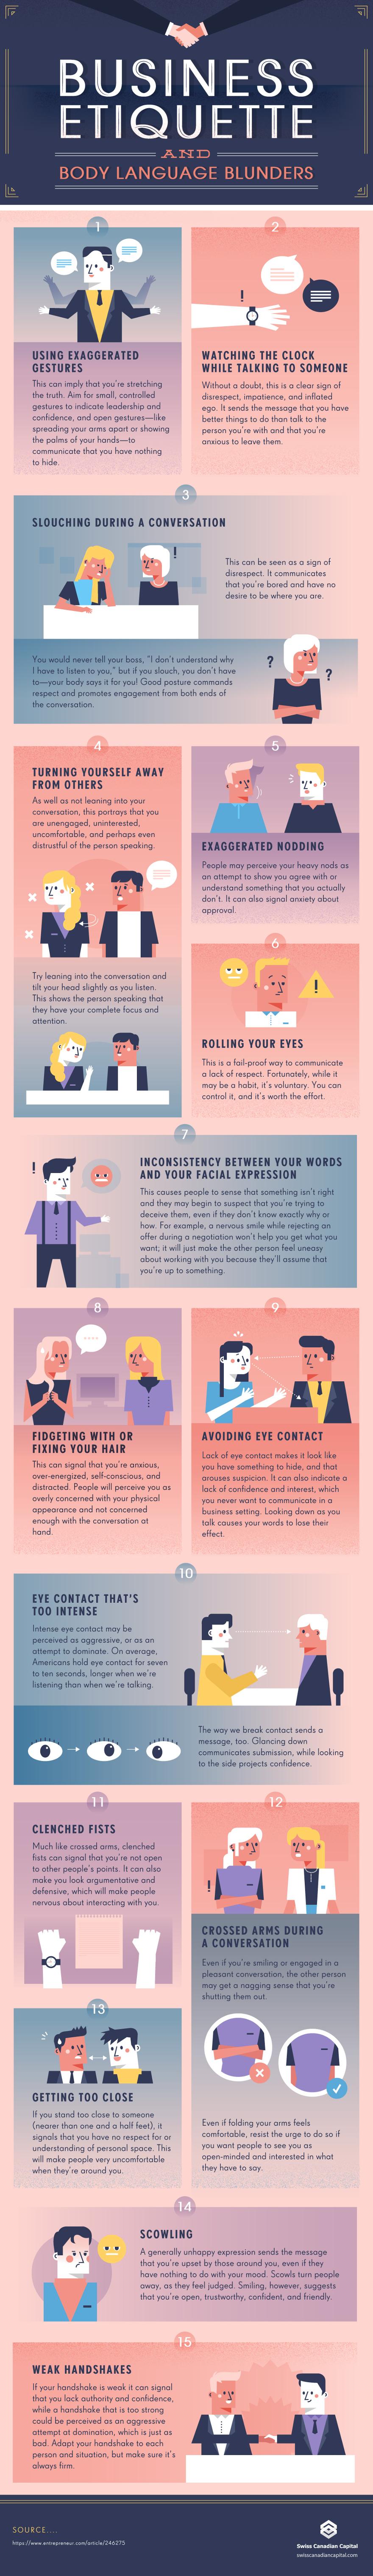 Business Etiquette - infographic